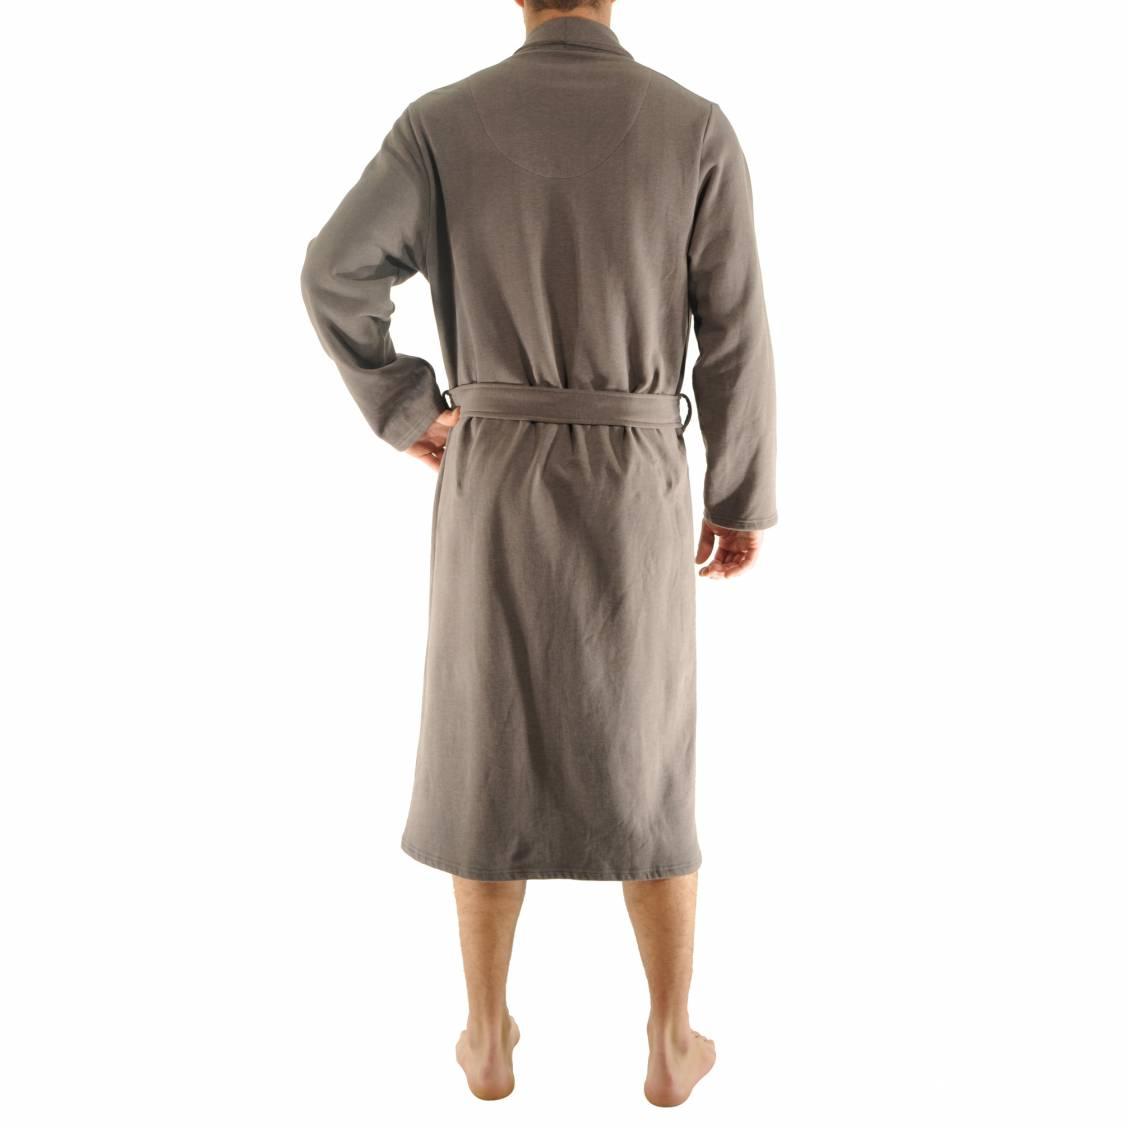 Robe de chambre gap christian cane en coton moletonn for Chambre xxl taupe